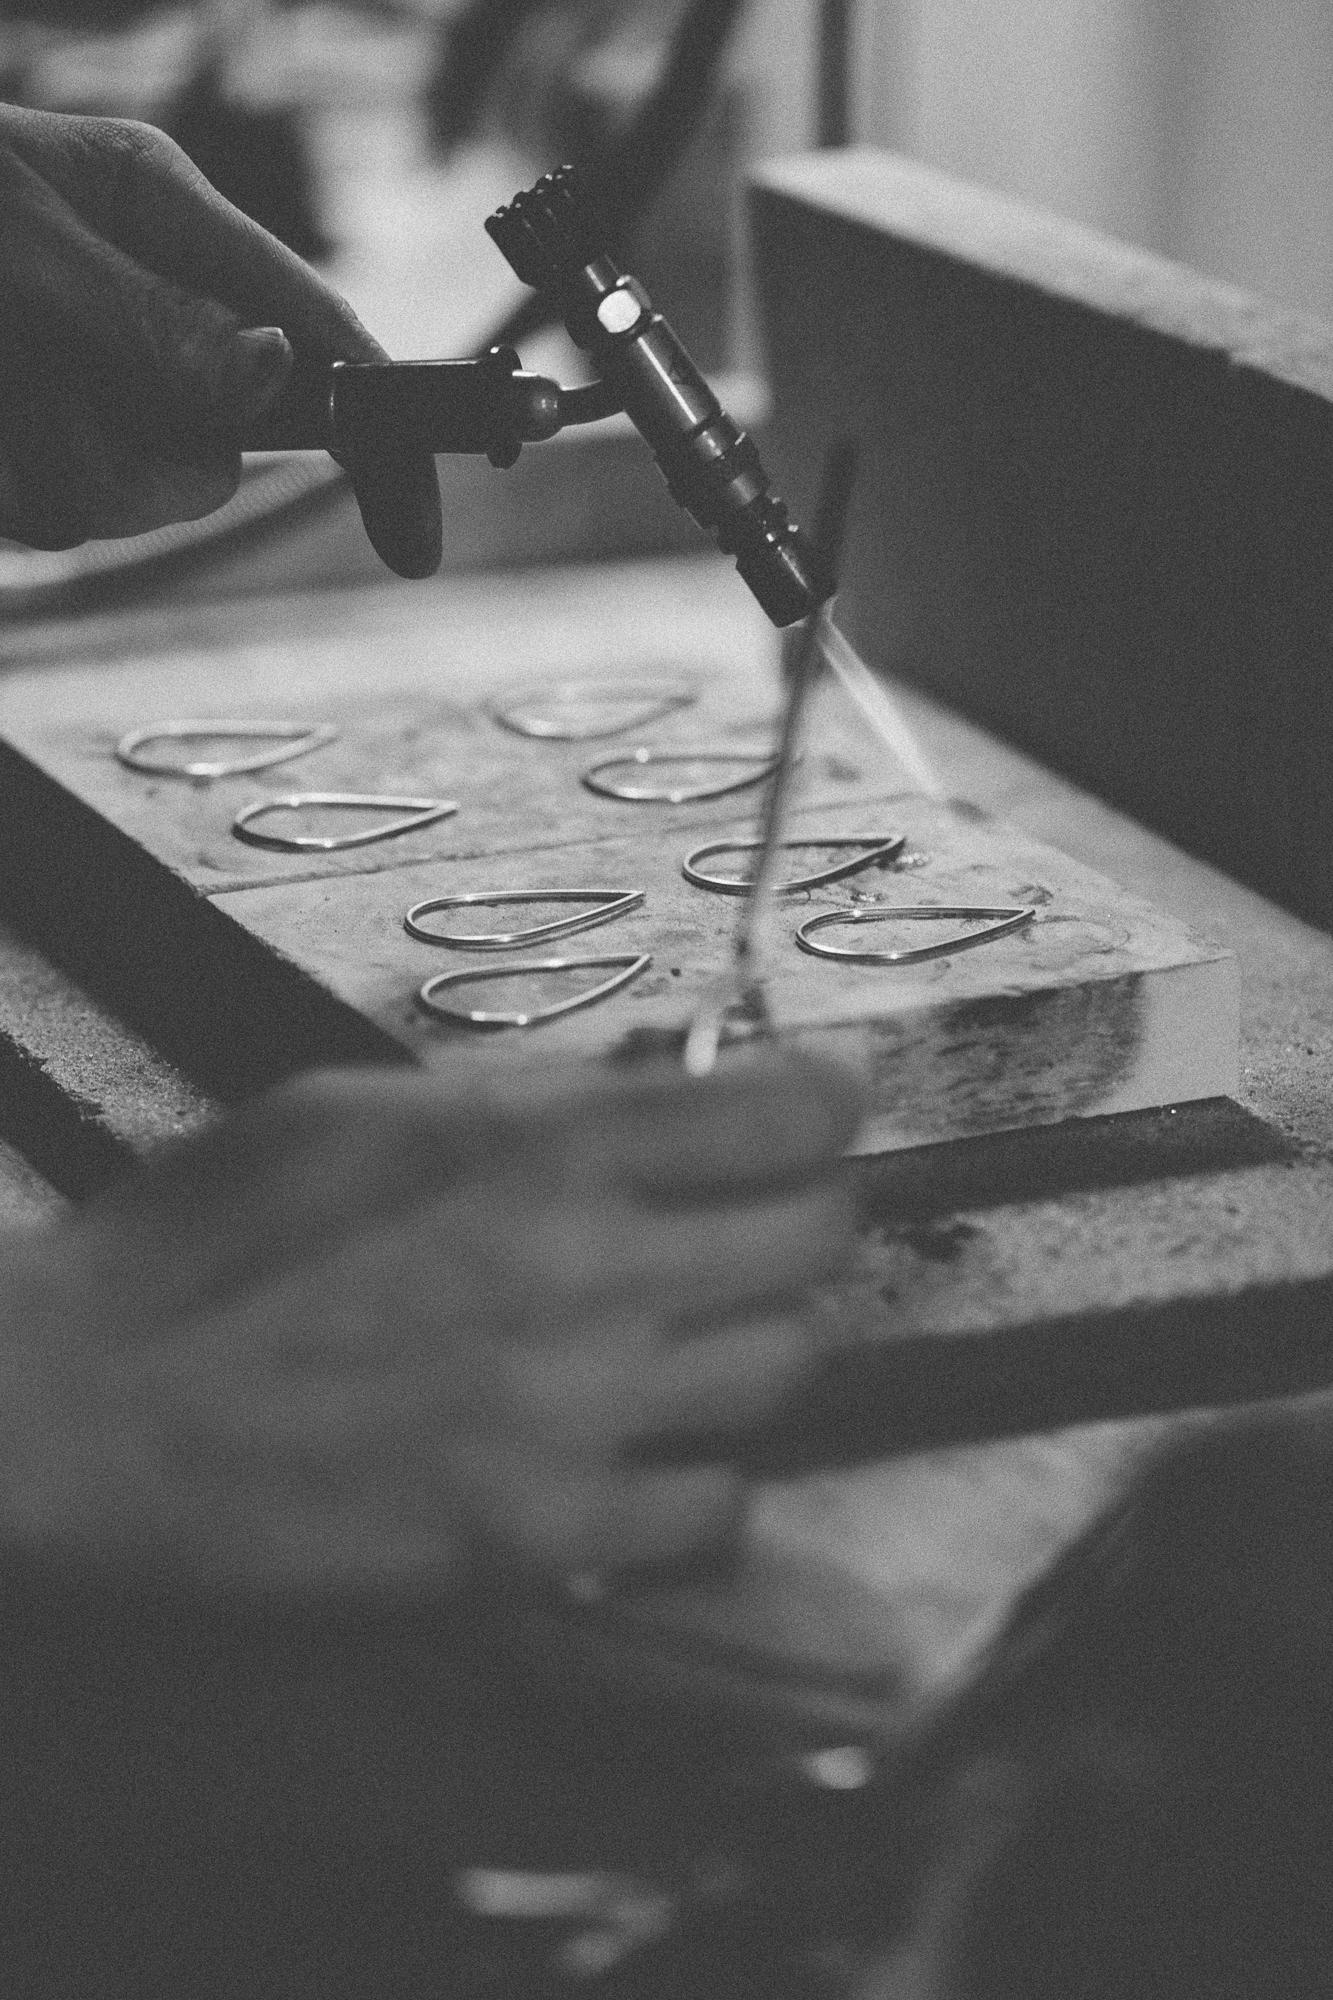 The making of Drop pendants.